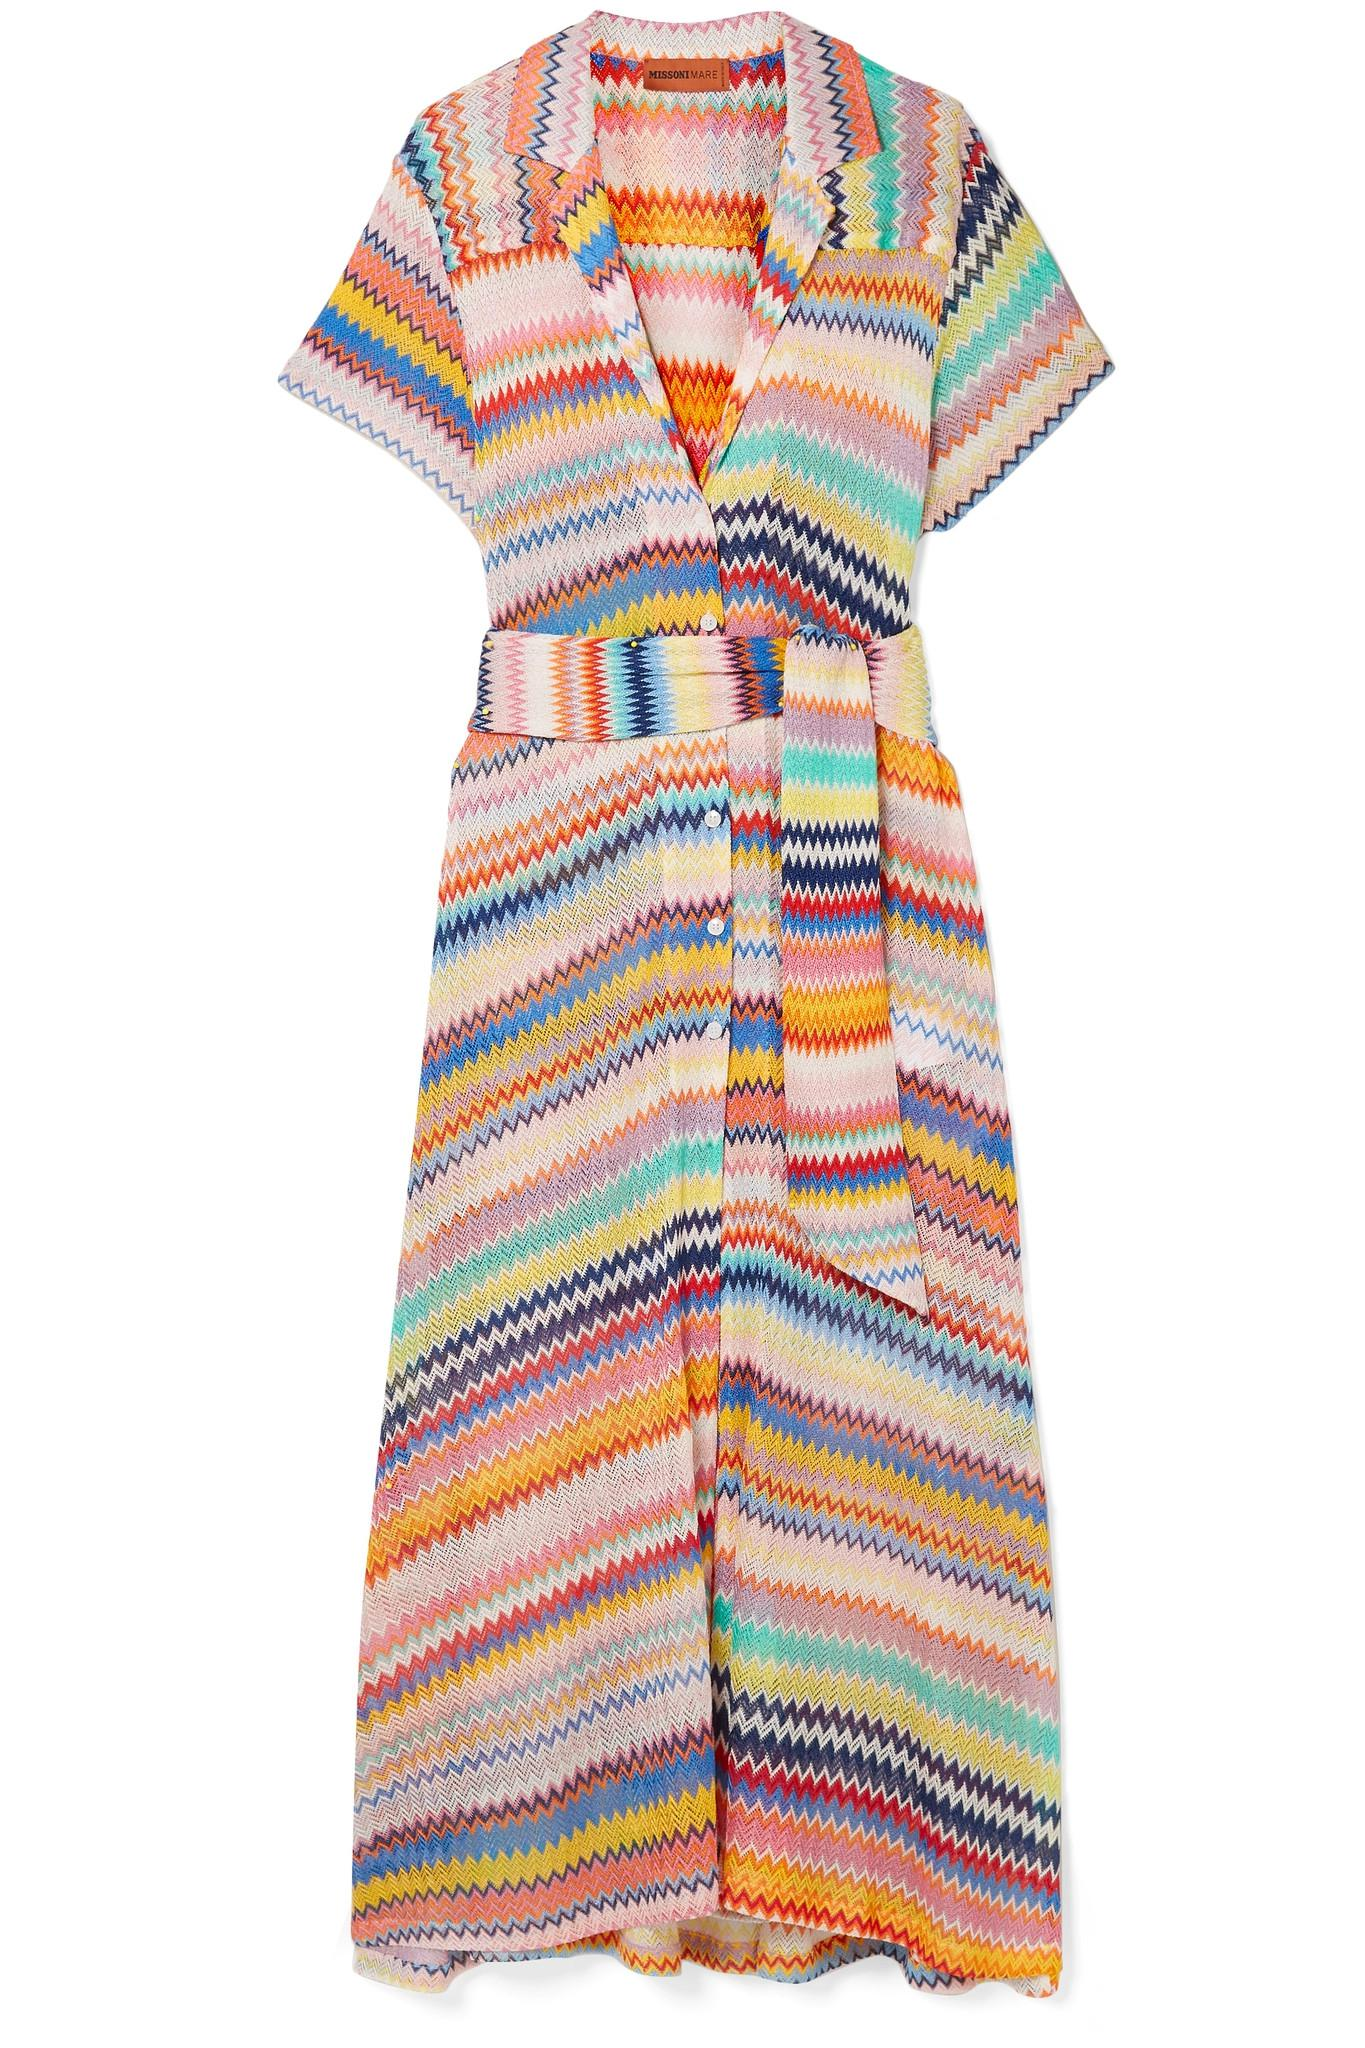 47aeffc4e2 Missoni Mare Belted Crochet-knit Midi Dress in White - Lyst